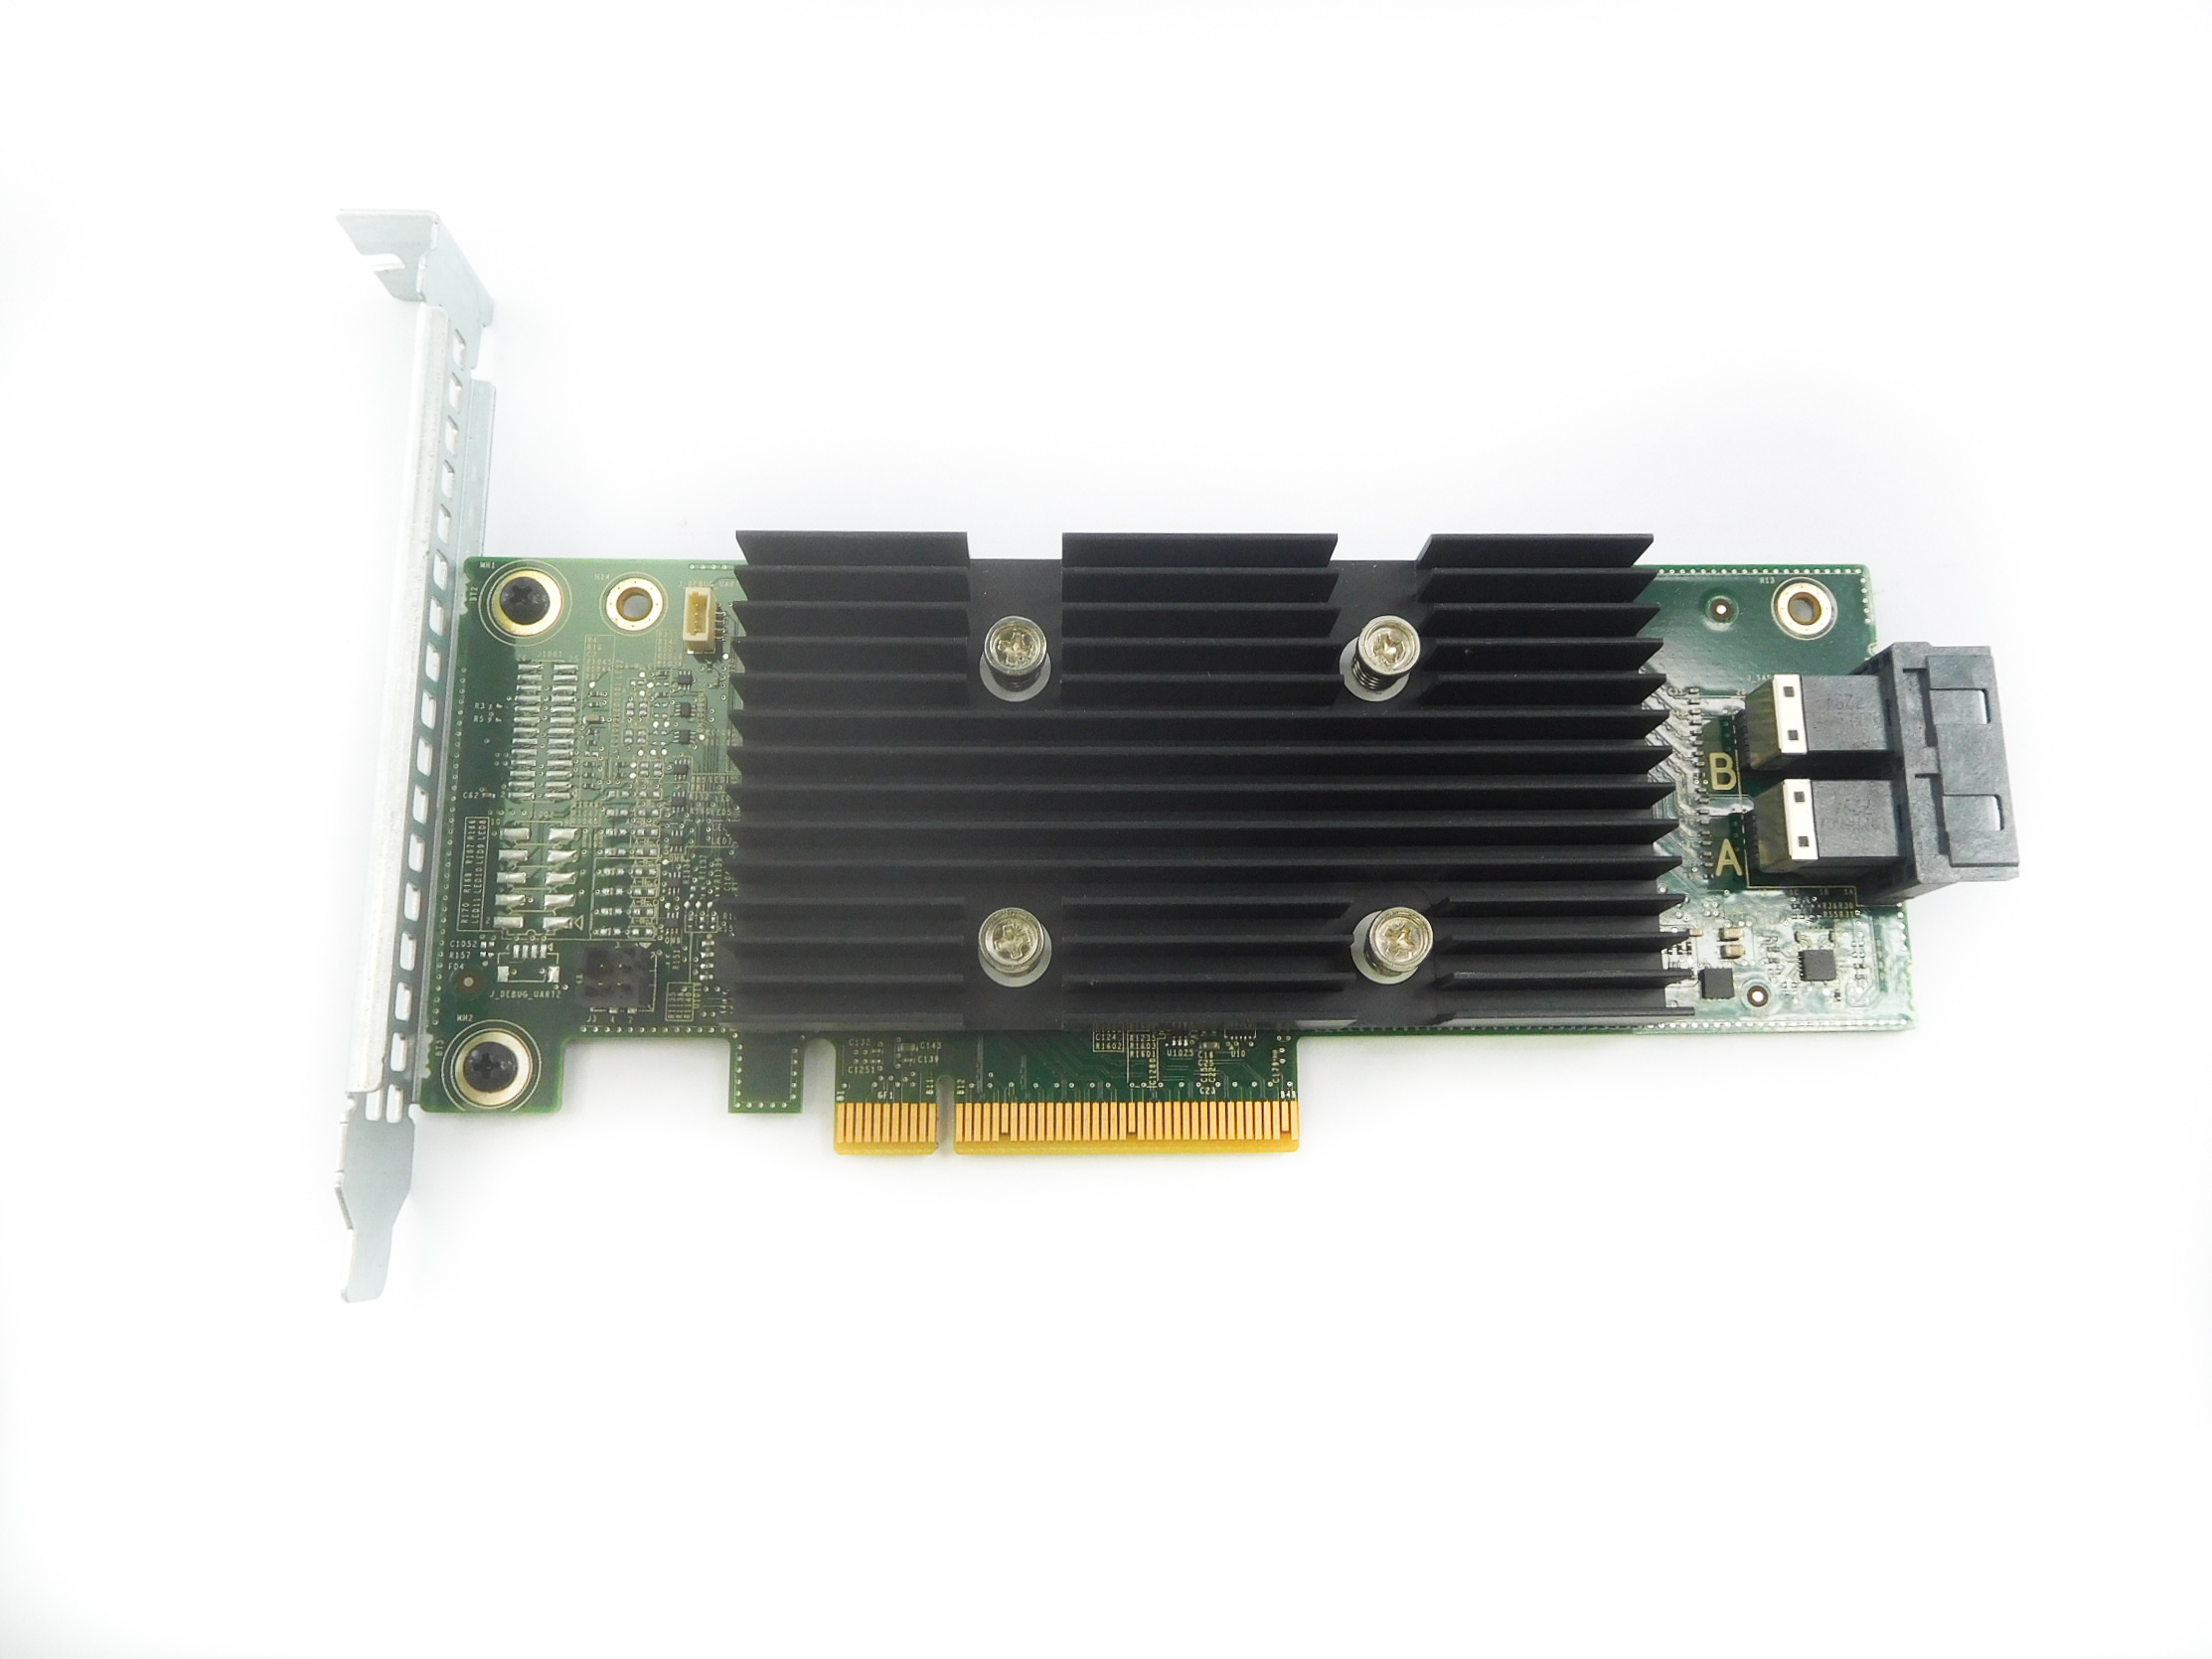 Dell 6H1G0 PERC H330 PCI-e SAS Raid Controller Adapter Card